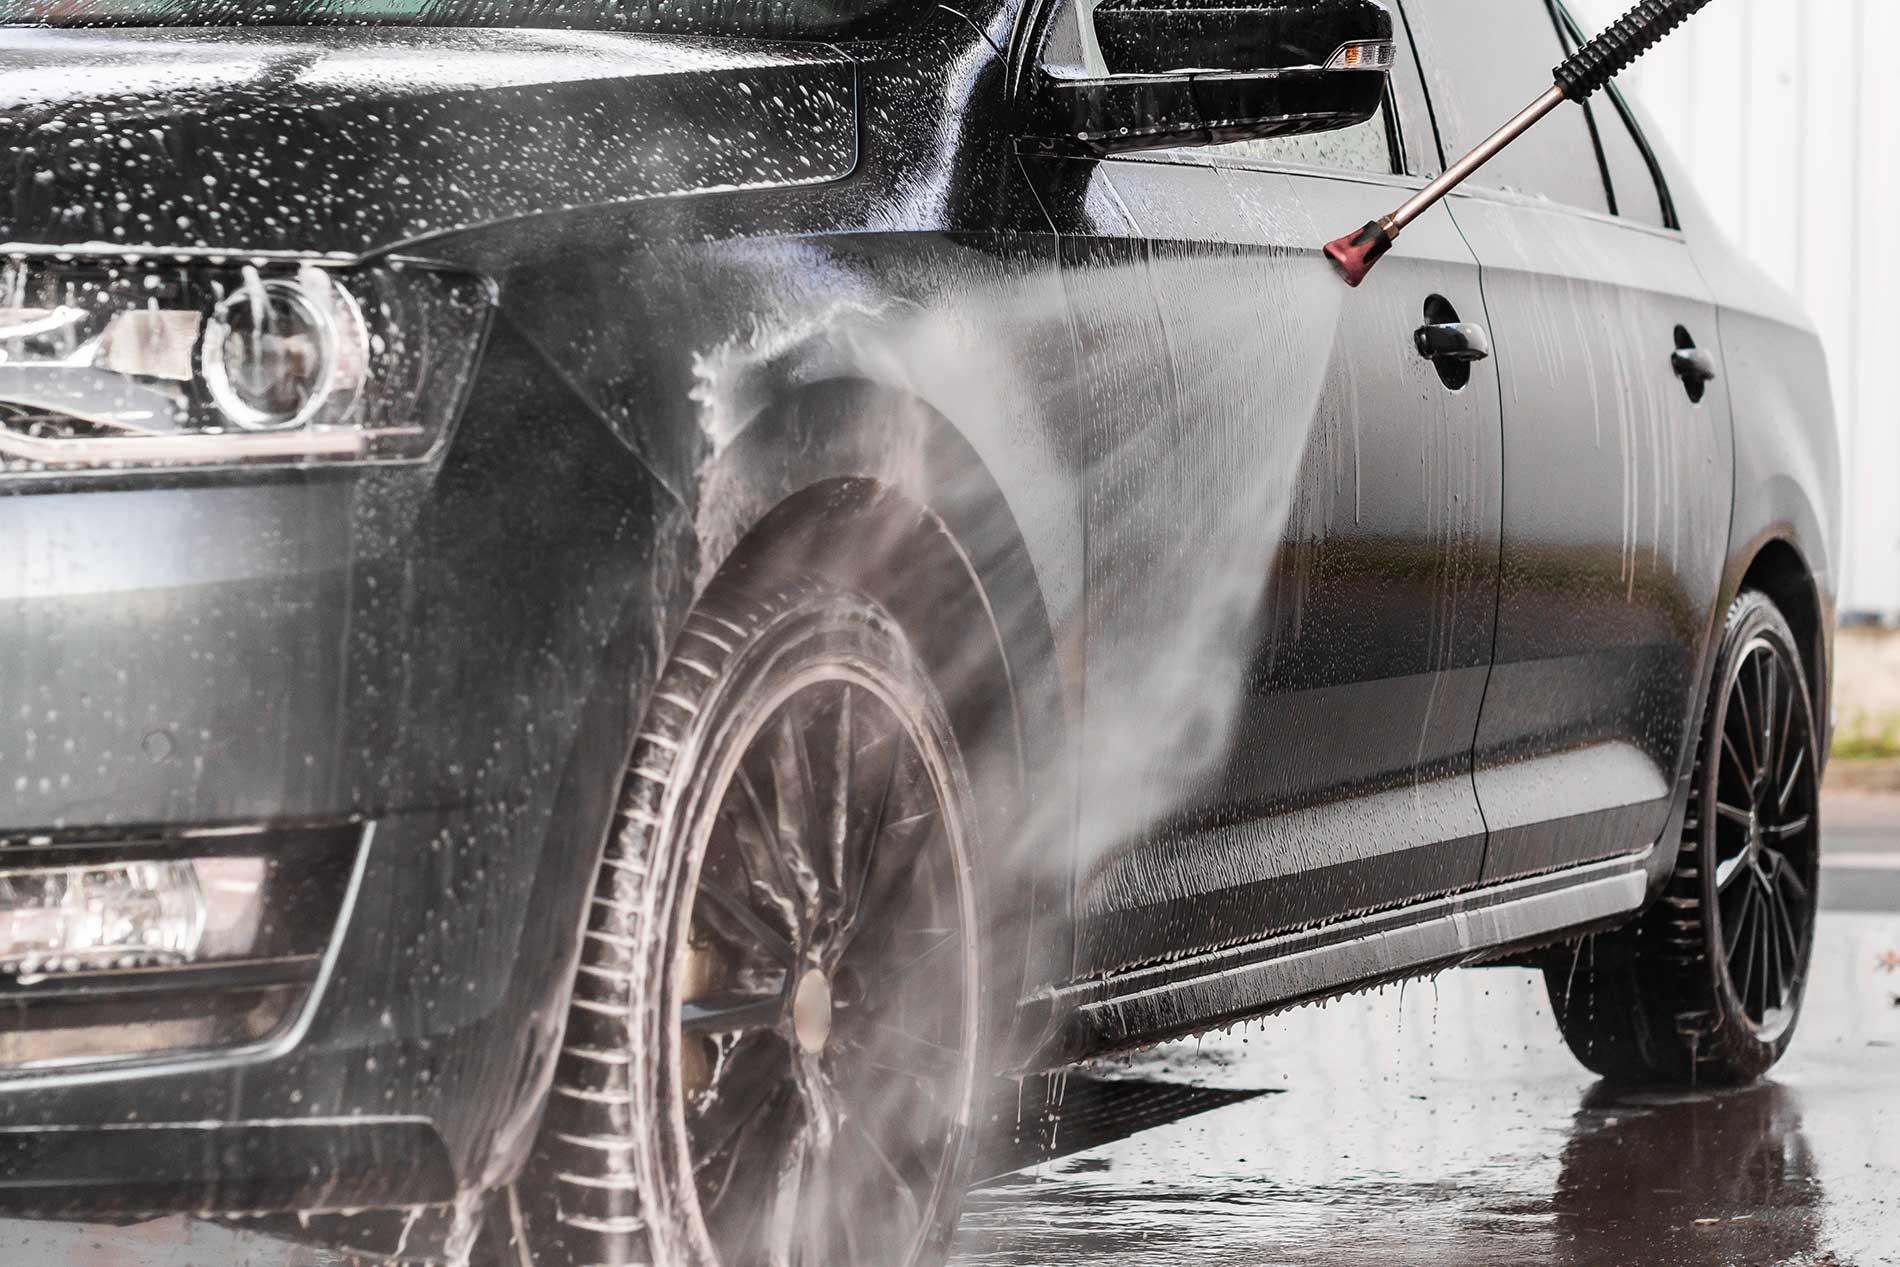 car-wash-waxing-kamloopsautorepair